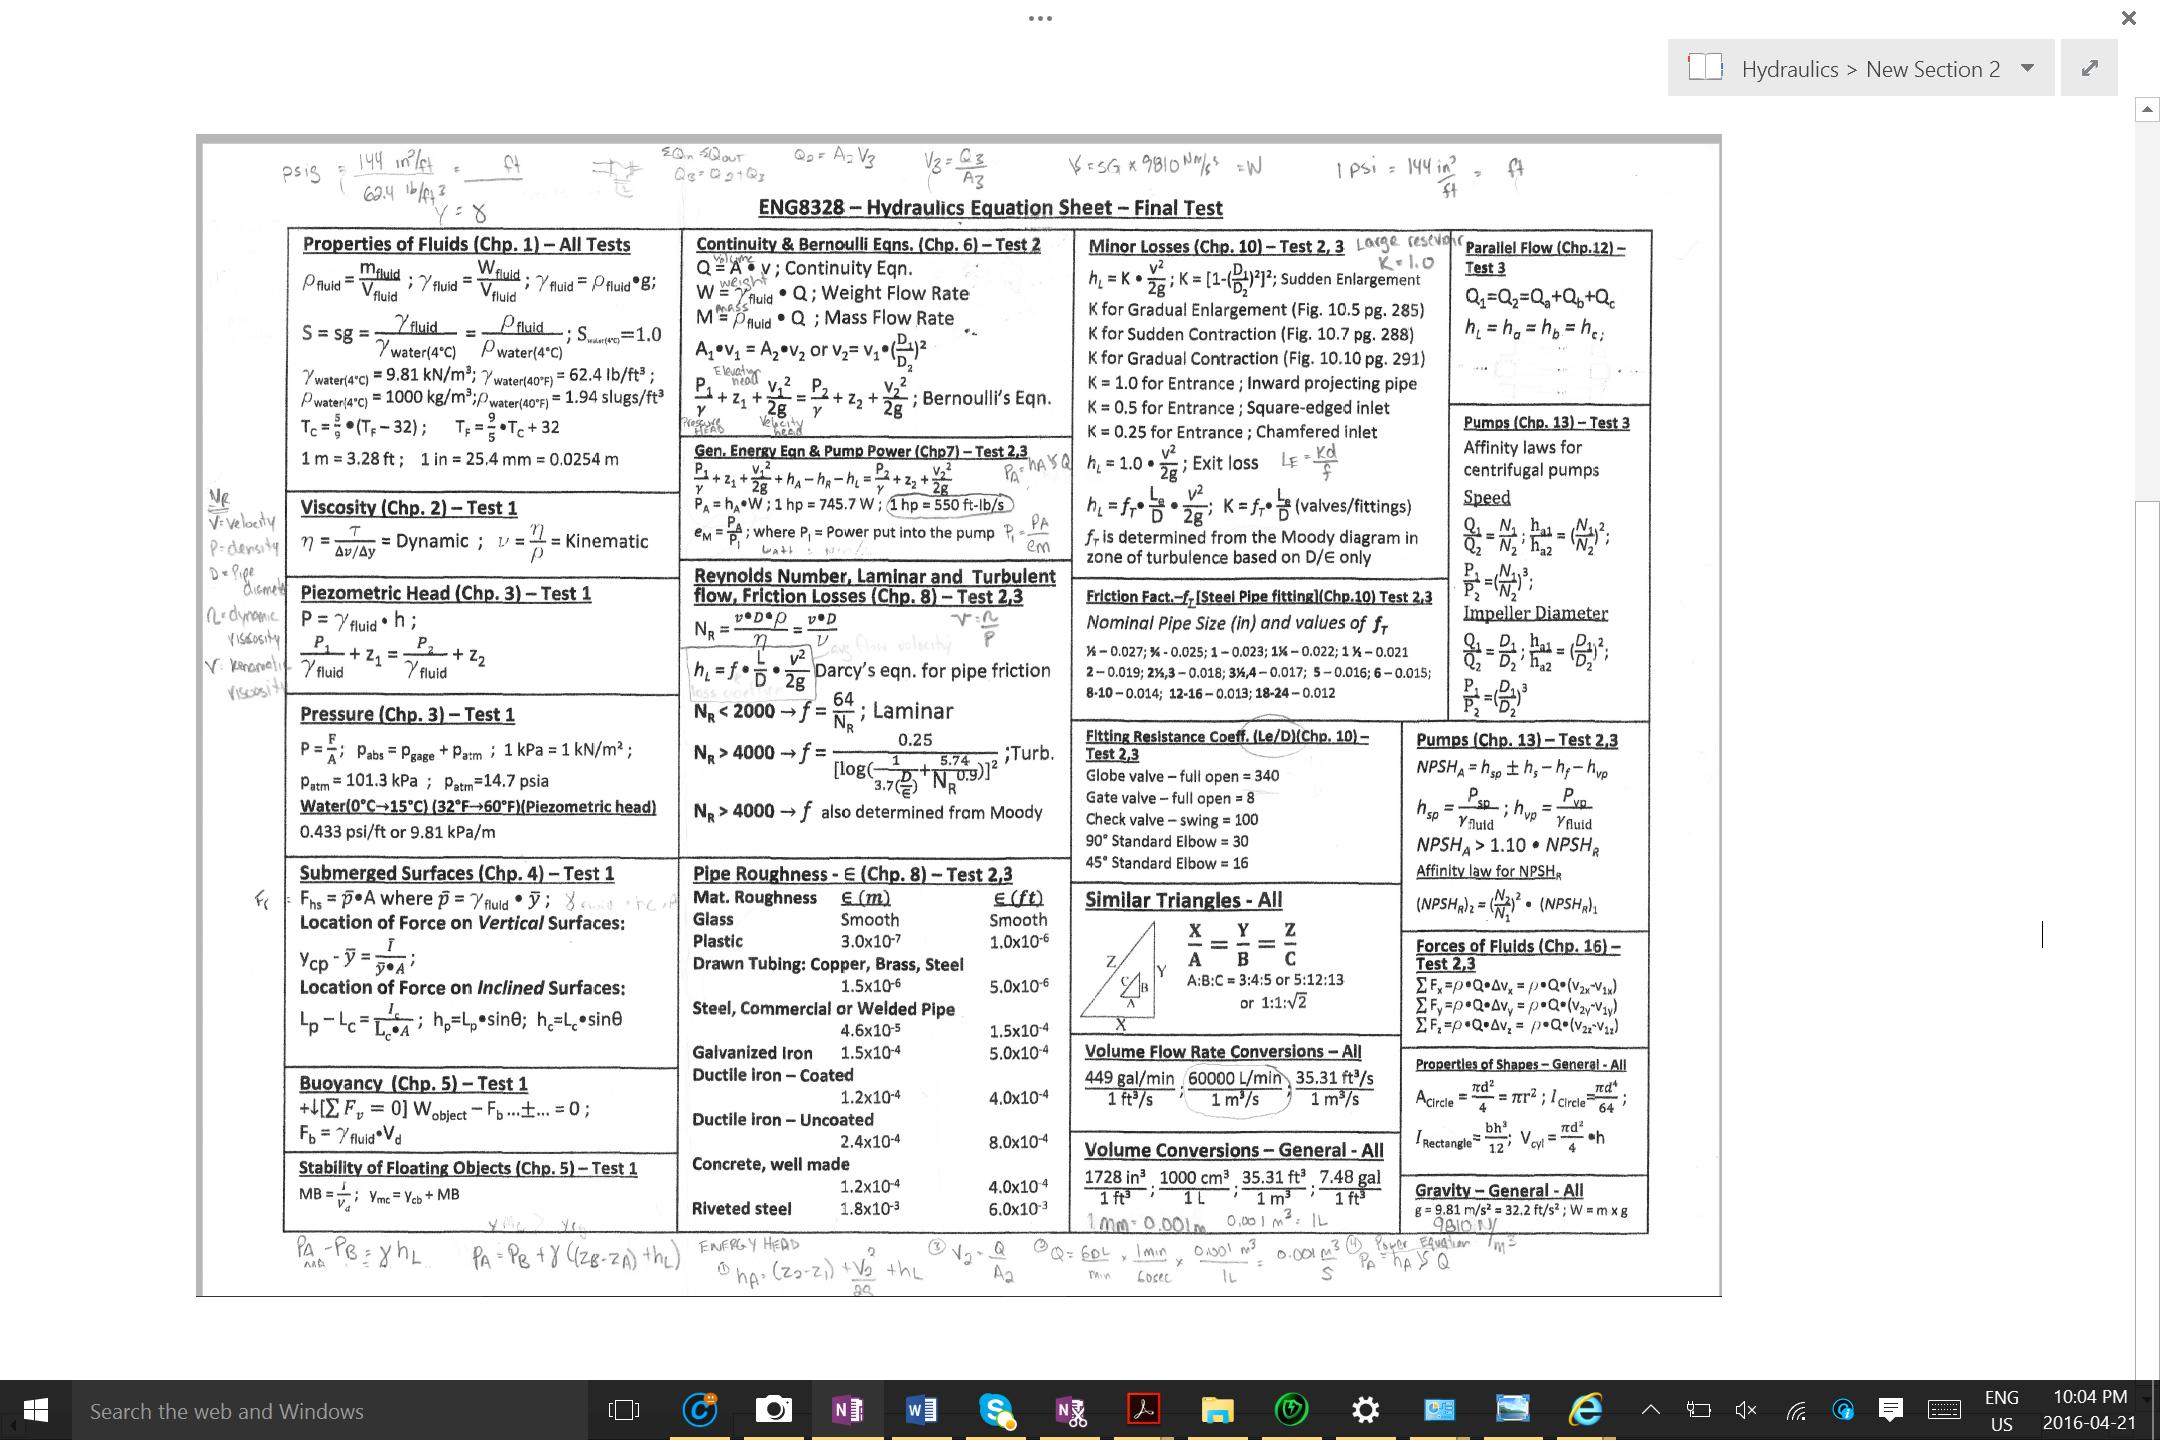 how to get hydraulic power formula